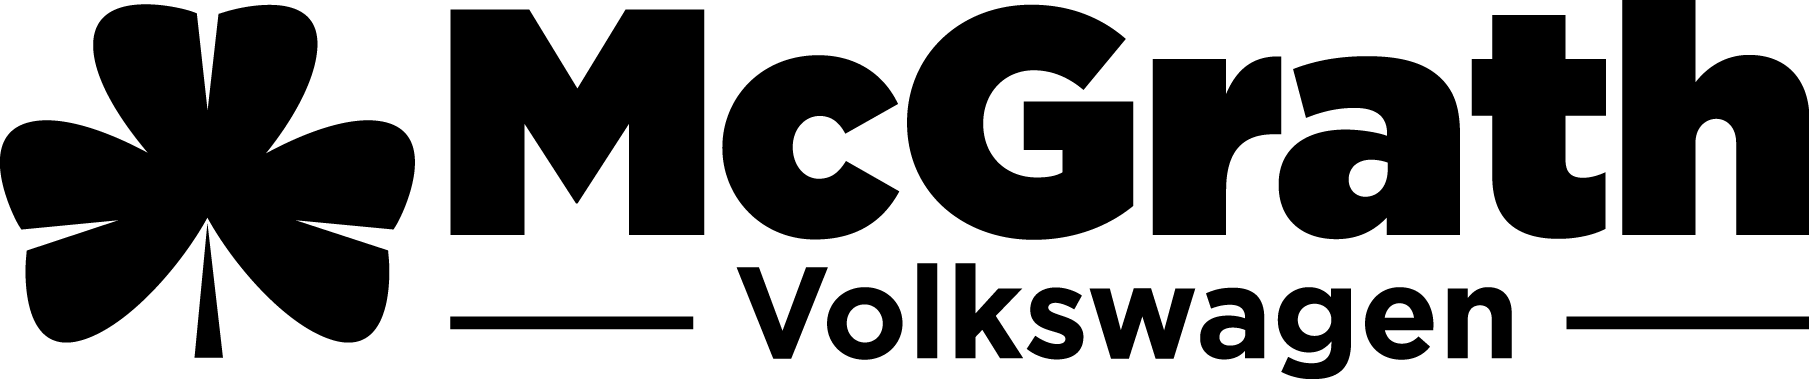 McGrath Logos - J.W. Morton & Associates Client Area